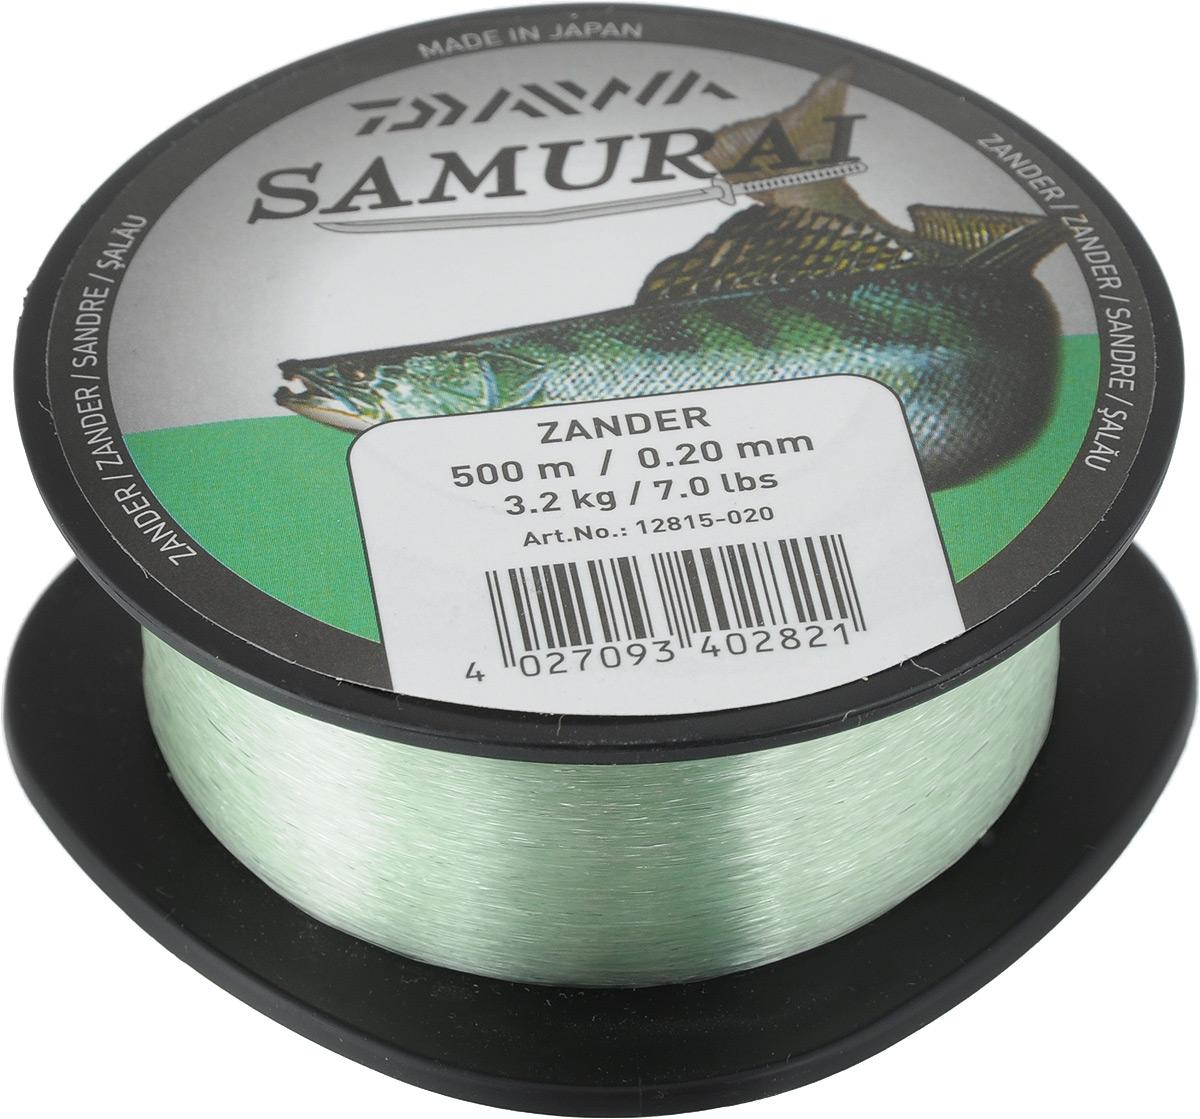 Леска Daiwa Samurai Zander, цвет: светло-зеленый, 500 м, 0,2 мм, 3,2 кг joakim zander ujuja i osa